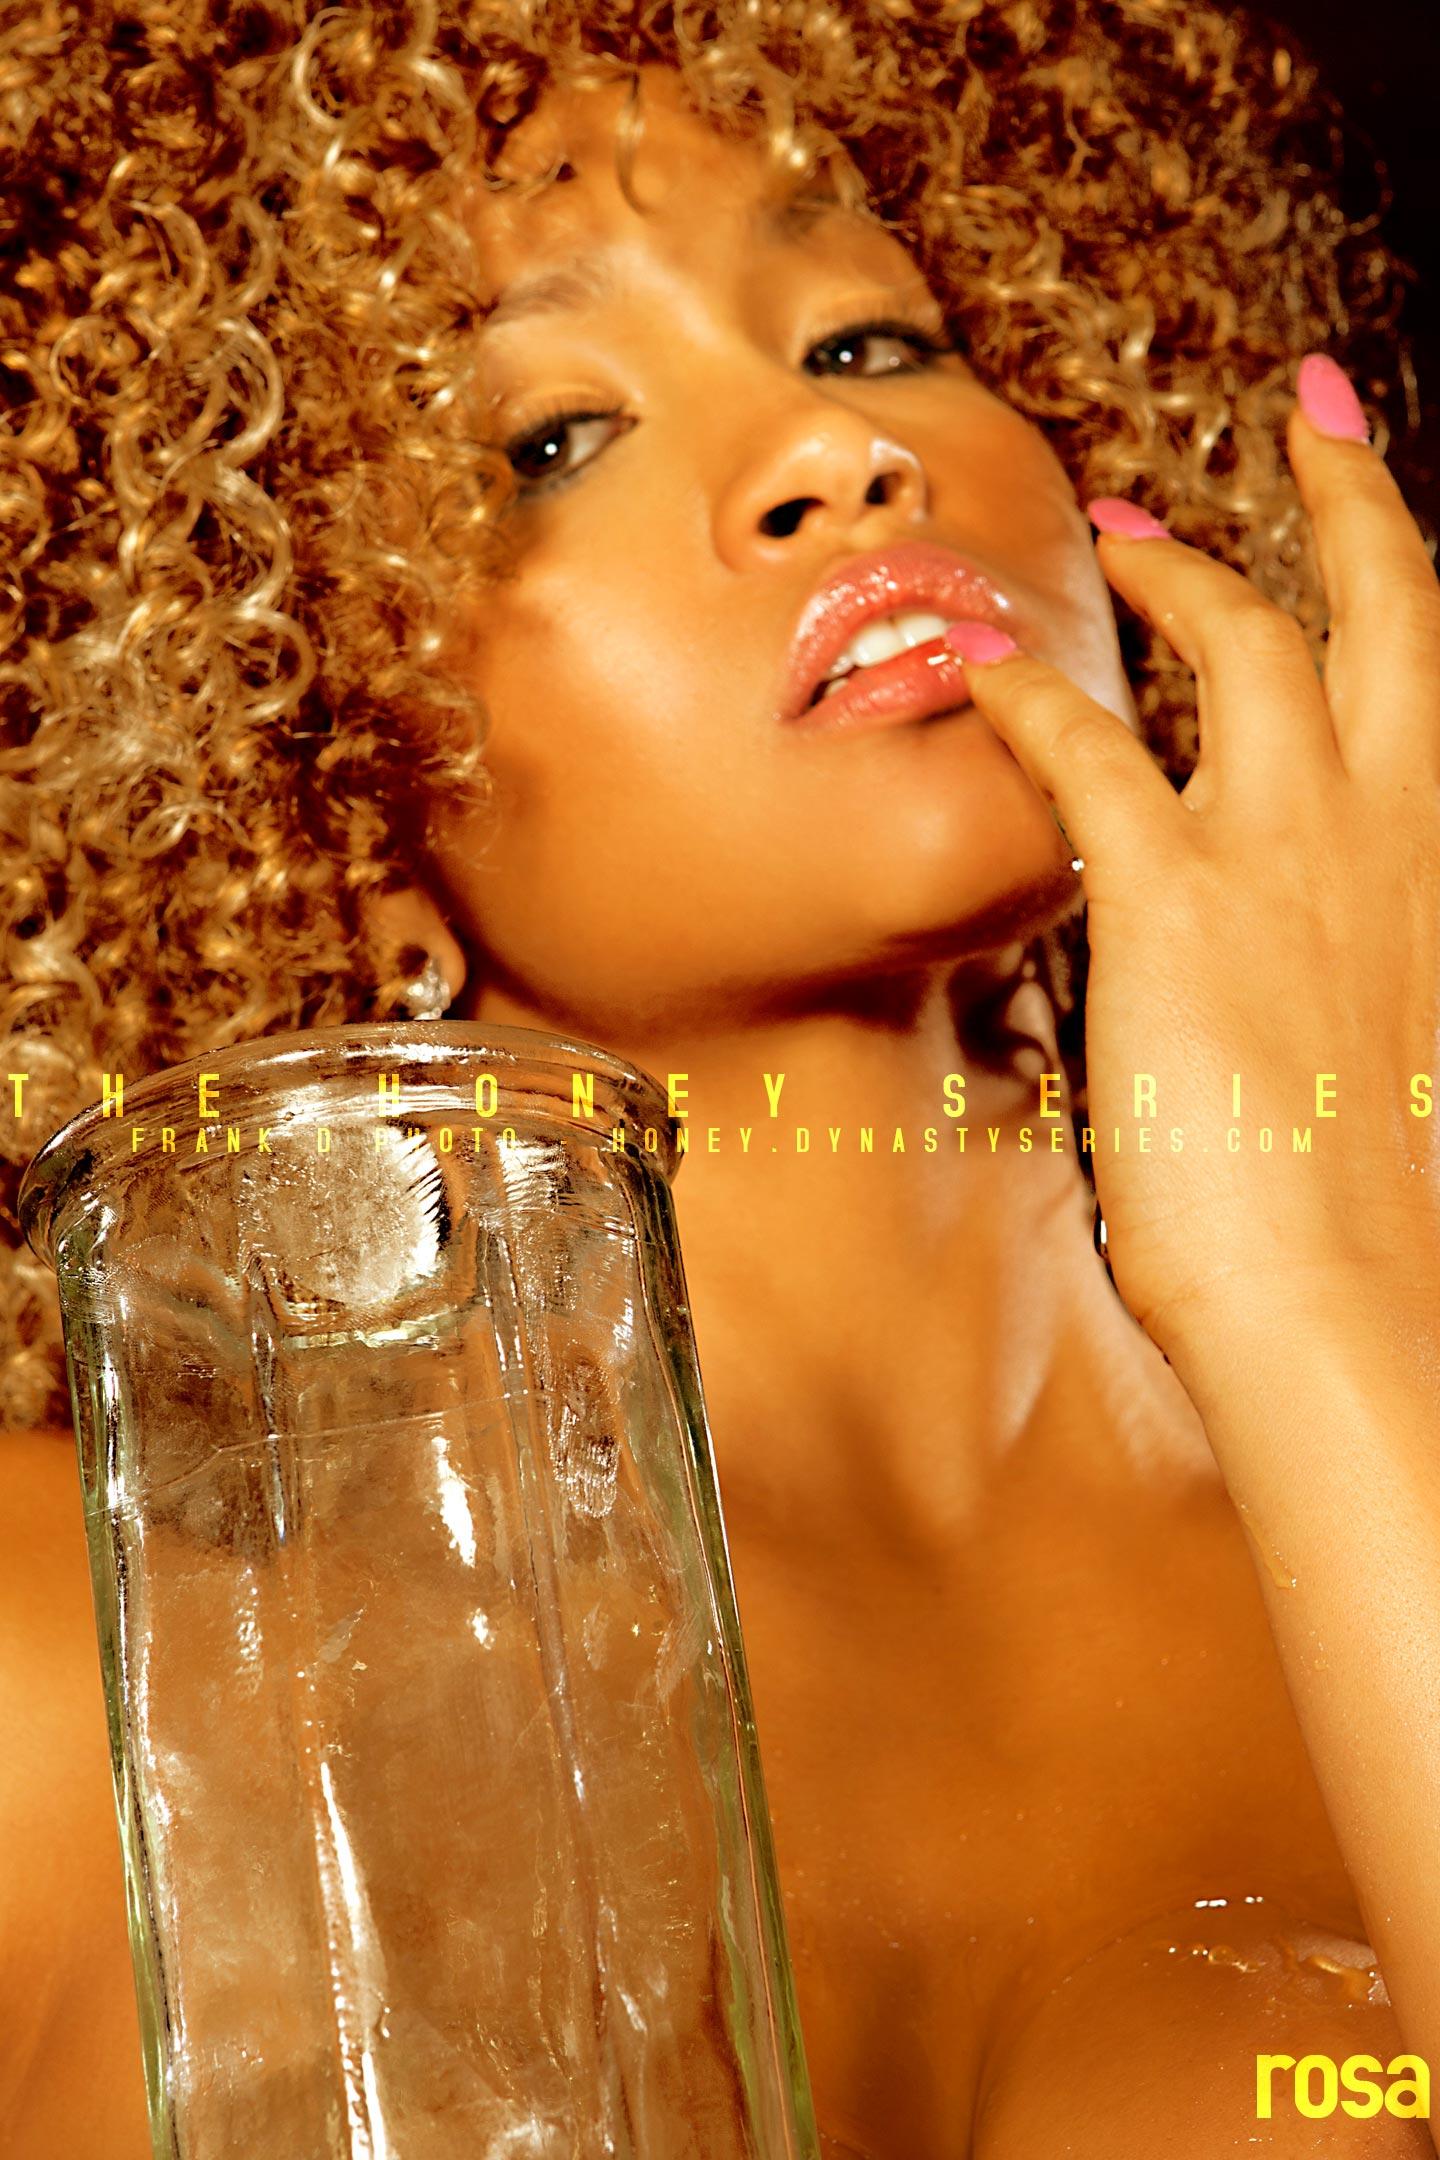 rosa-acosta-thehoneyseries-dynastyseries-10